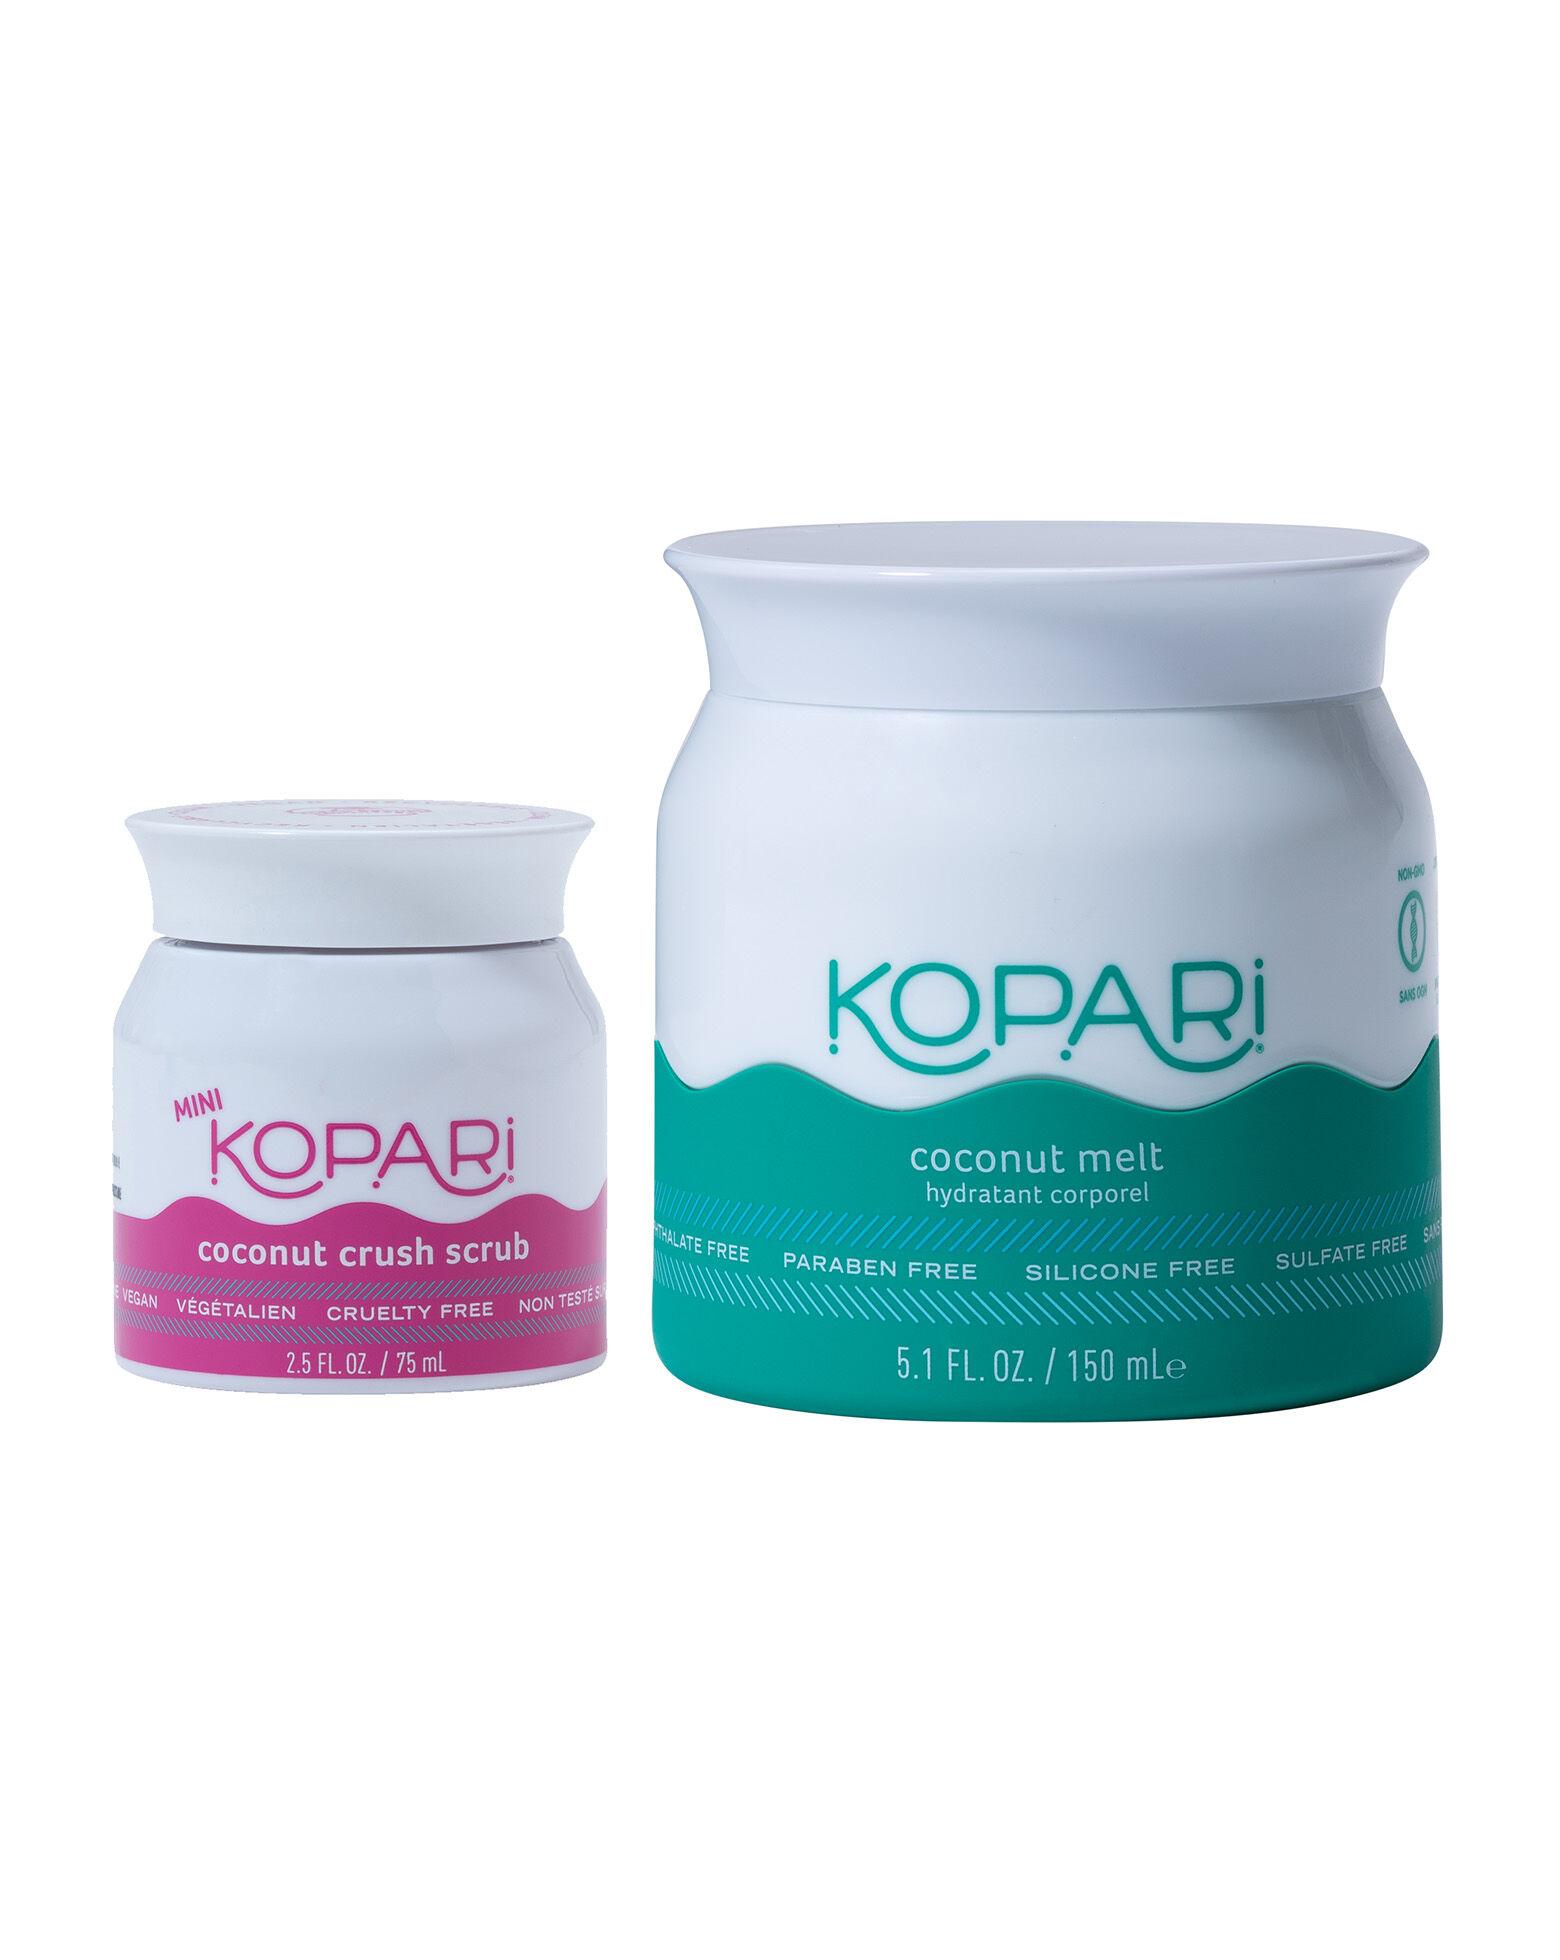 Kopari Beauty - Body Hydration Duo